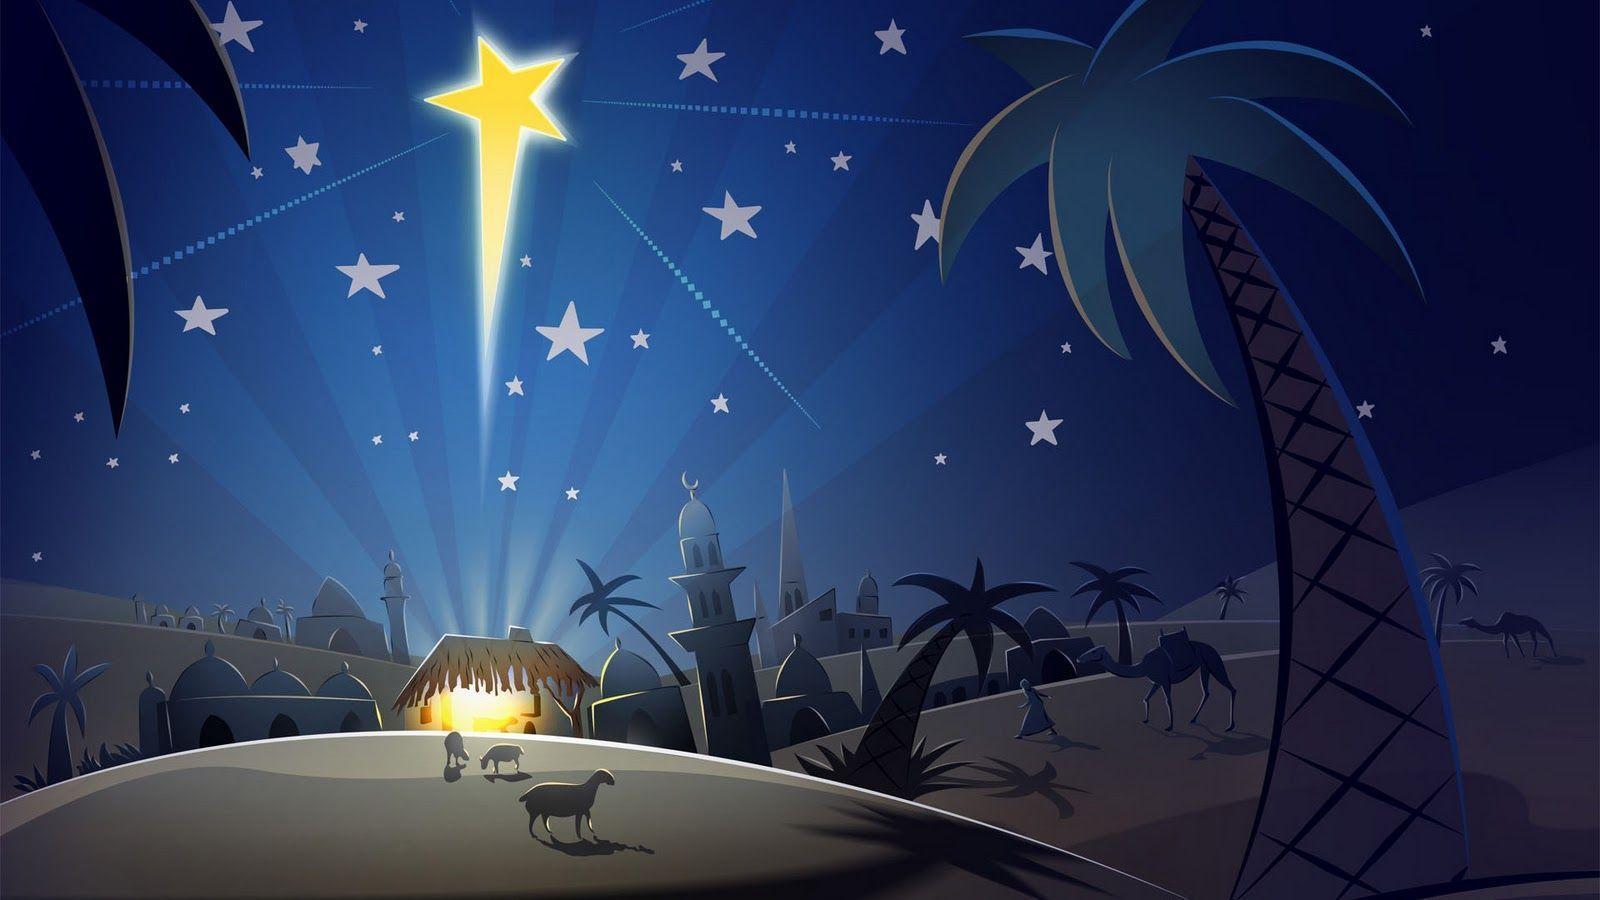 Christmas star wallpapers wallpaper cave - Paysages de noel gratuits ...